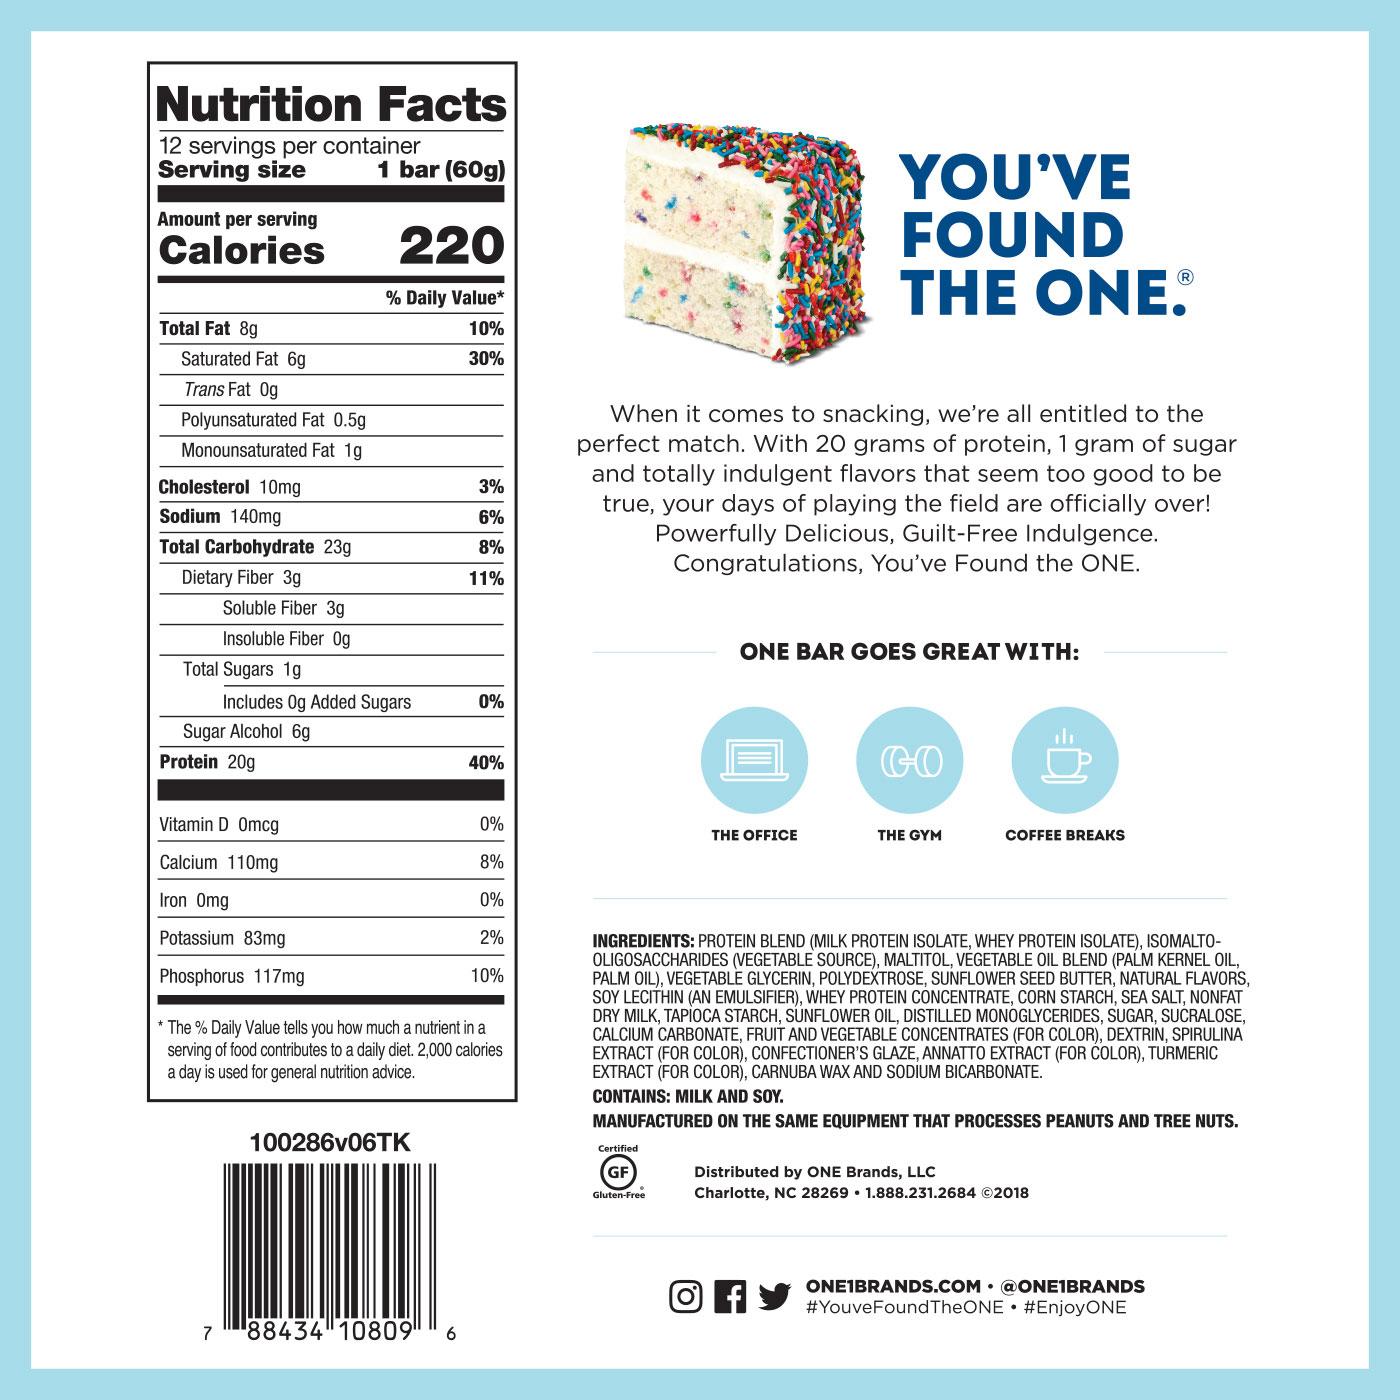 ONE Bar Birthday Cake Protein Bar | 20g Protein. 1g Sugar.